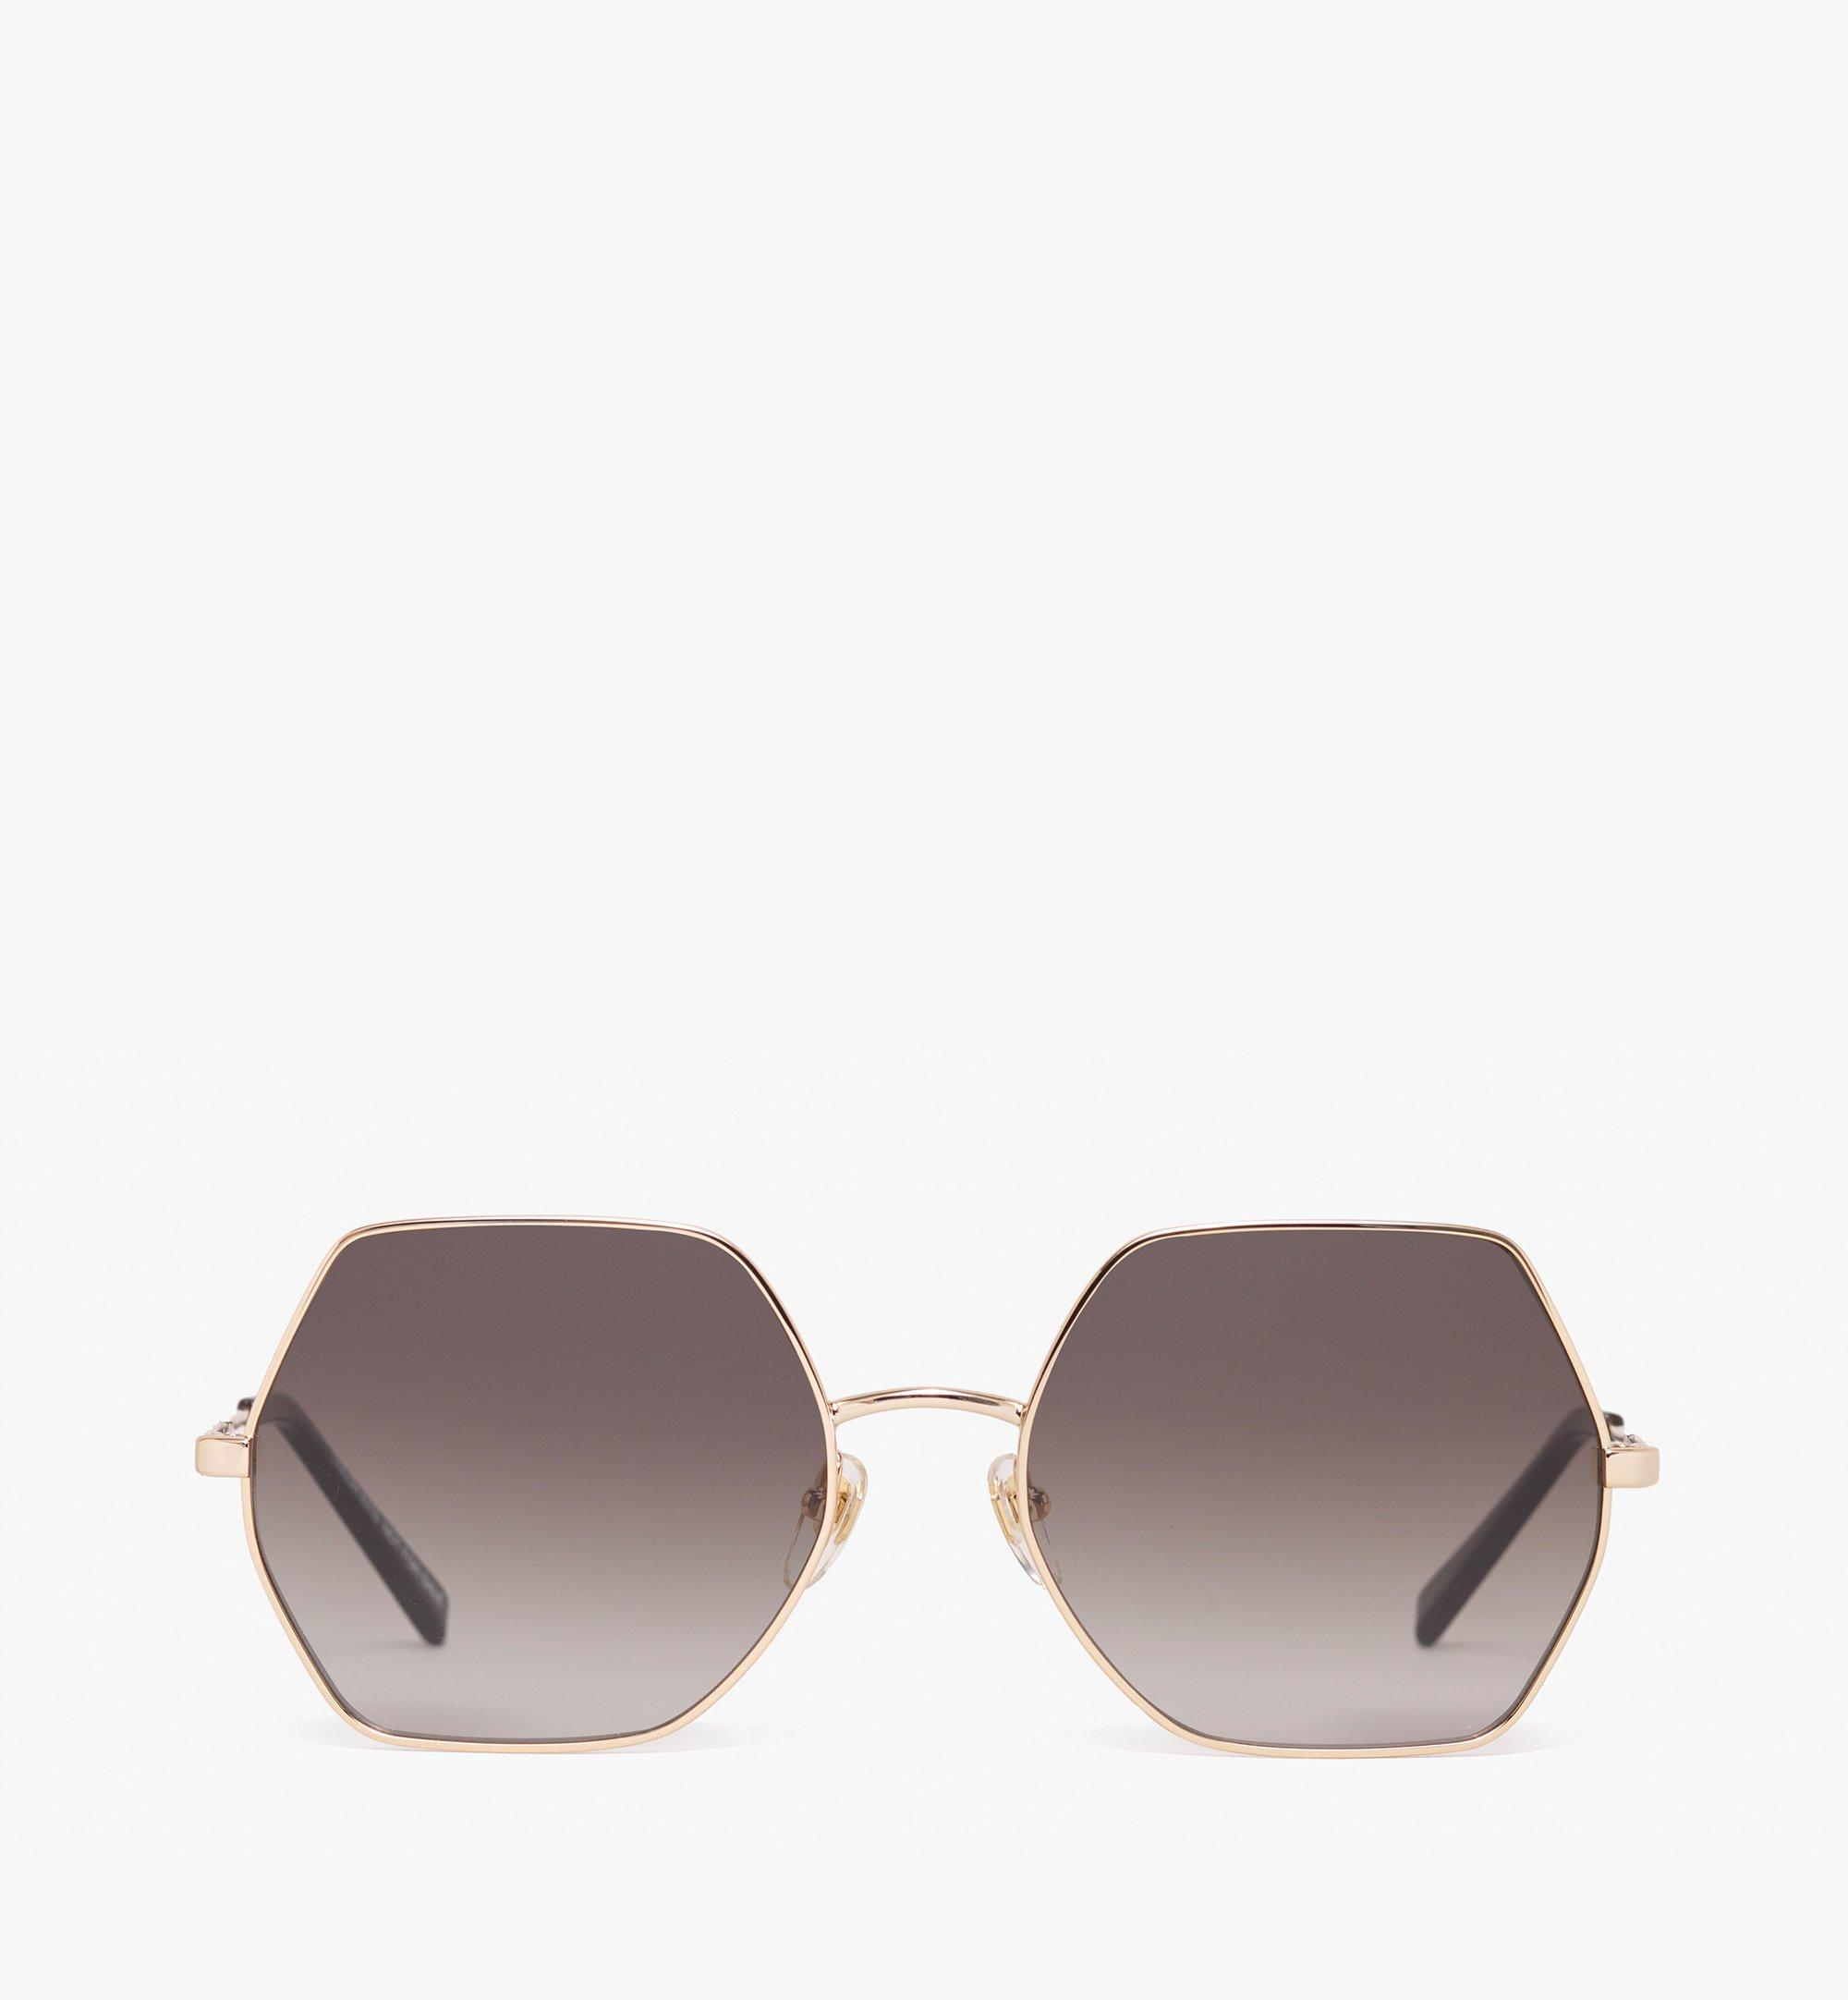 MCM Geometric Oversized Sunglasses Grey MEG9A2I06EG001 Alternate View 1